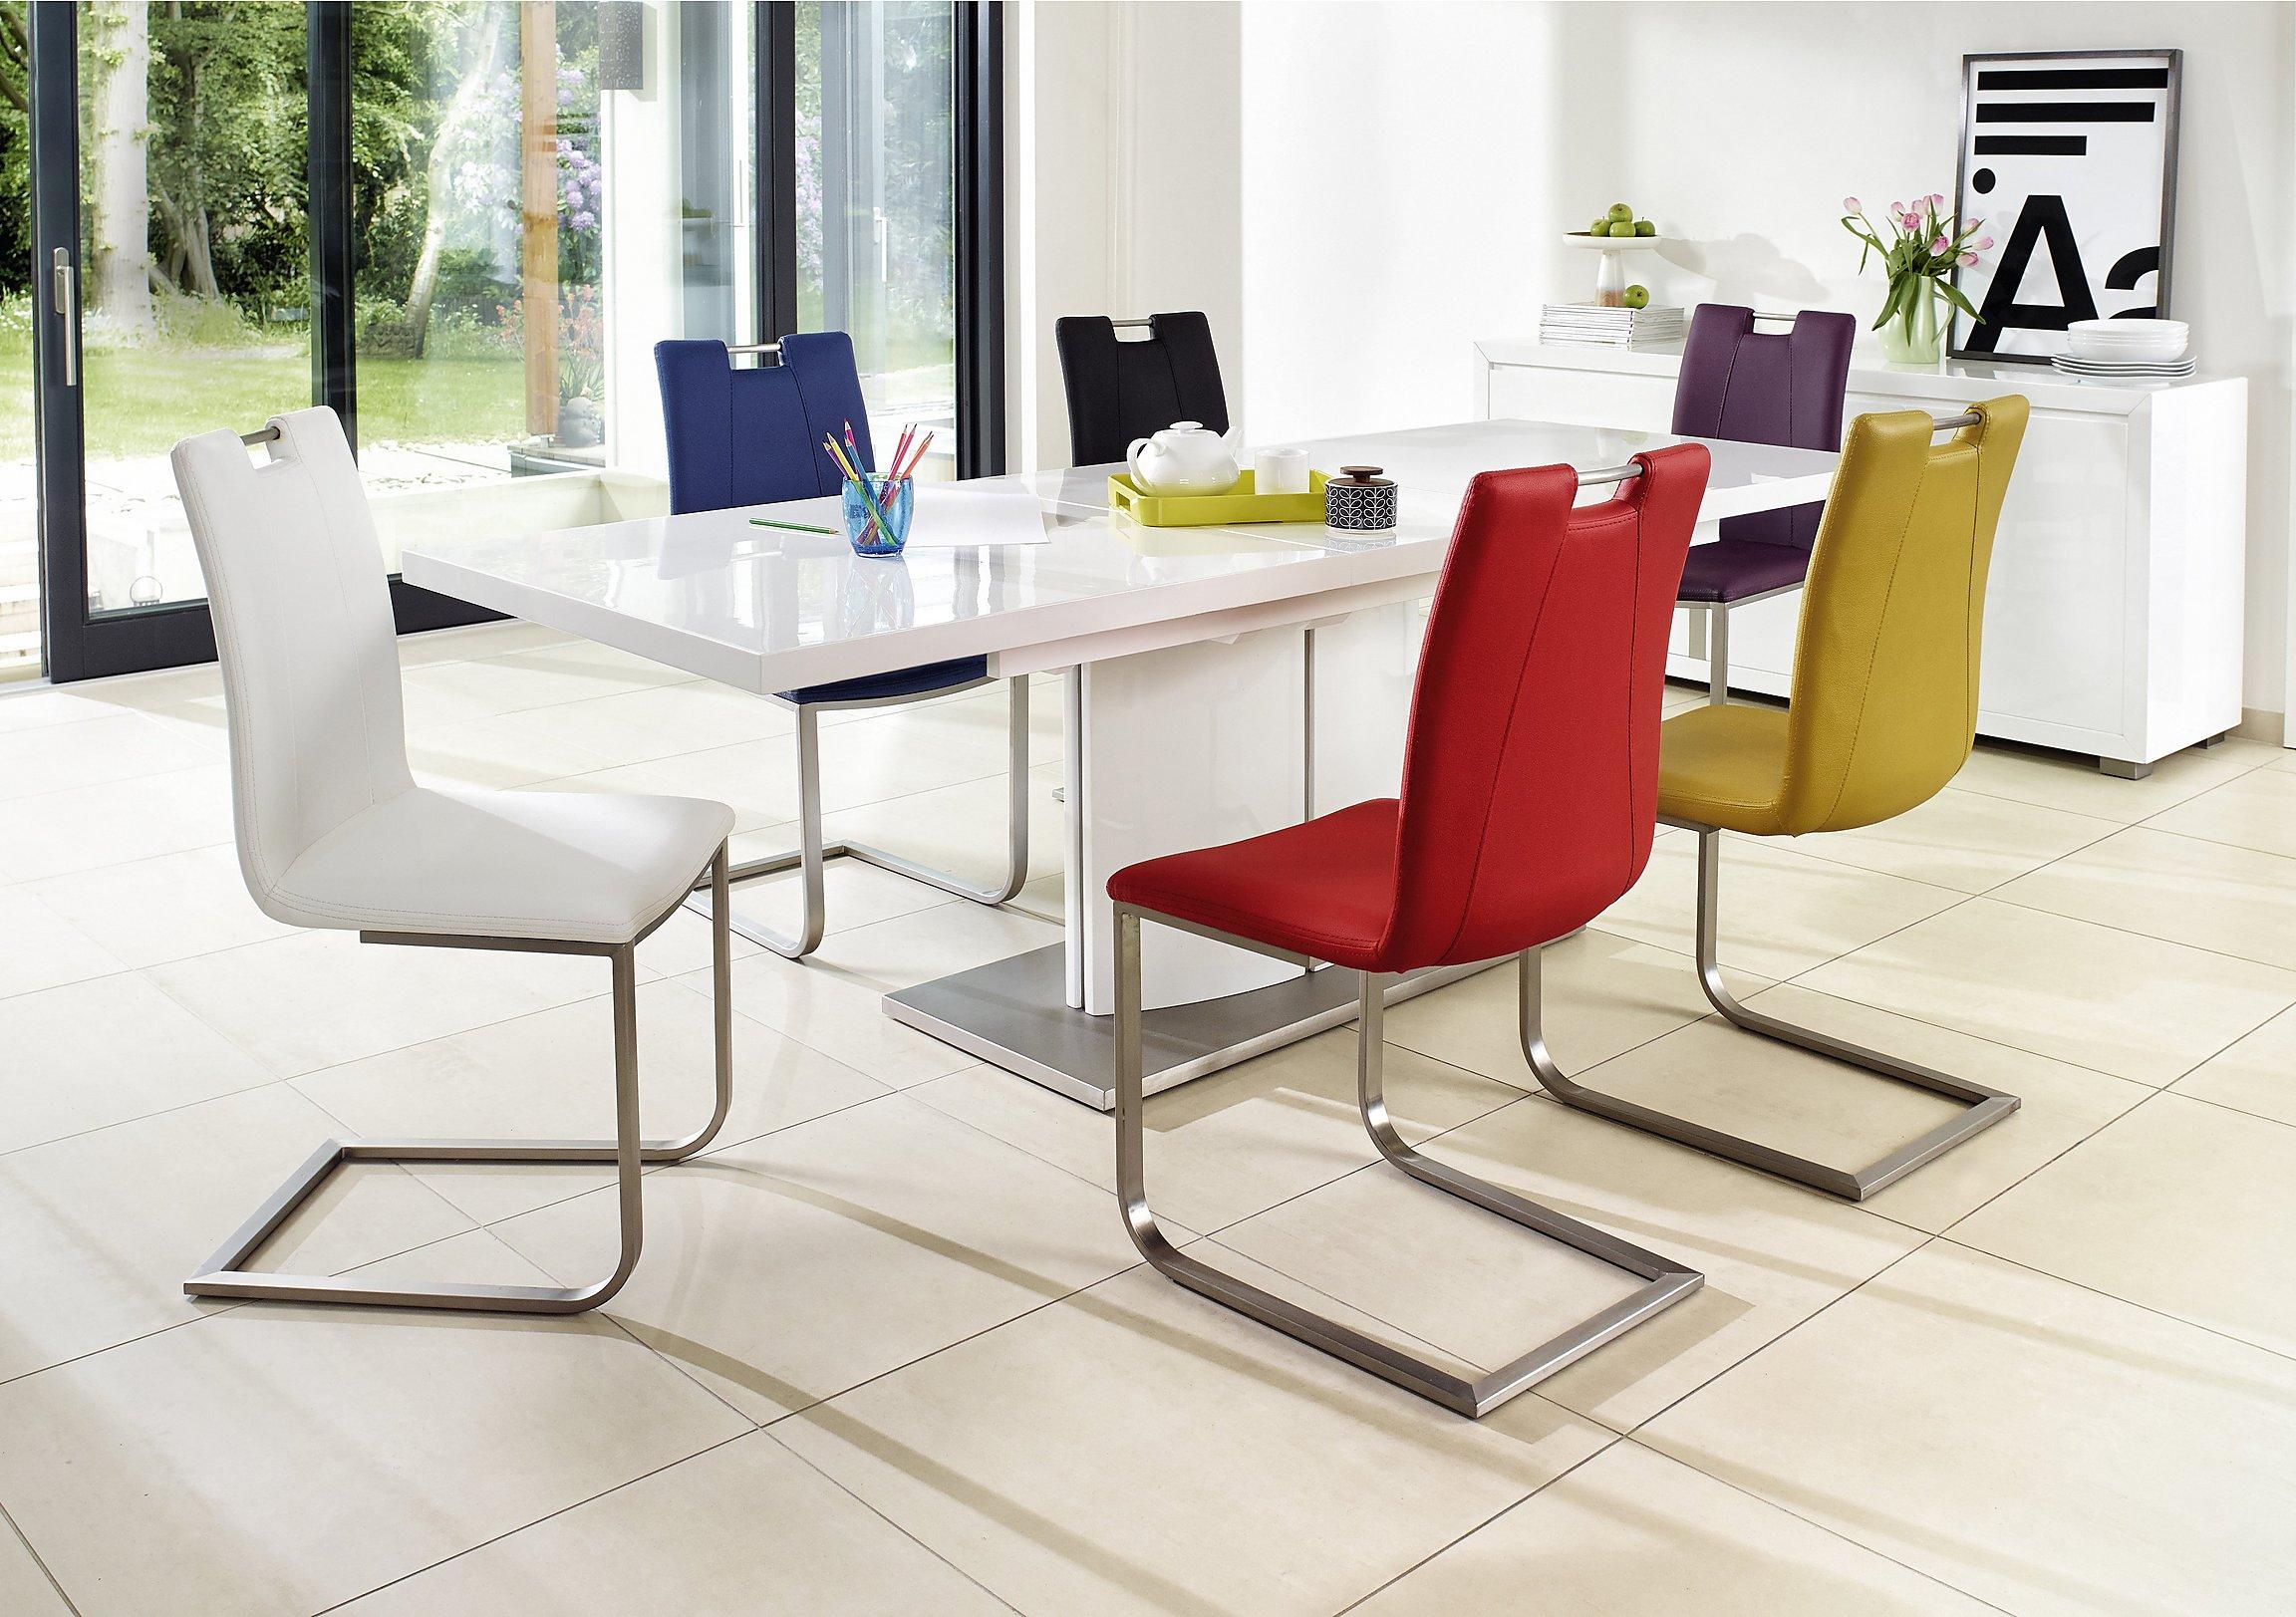 Grande White High Gloss Extending Dining Table - Furniture Village